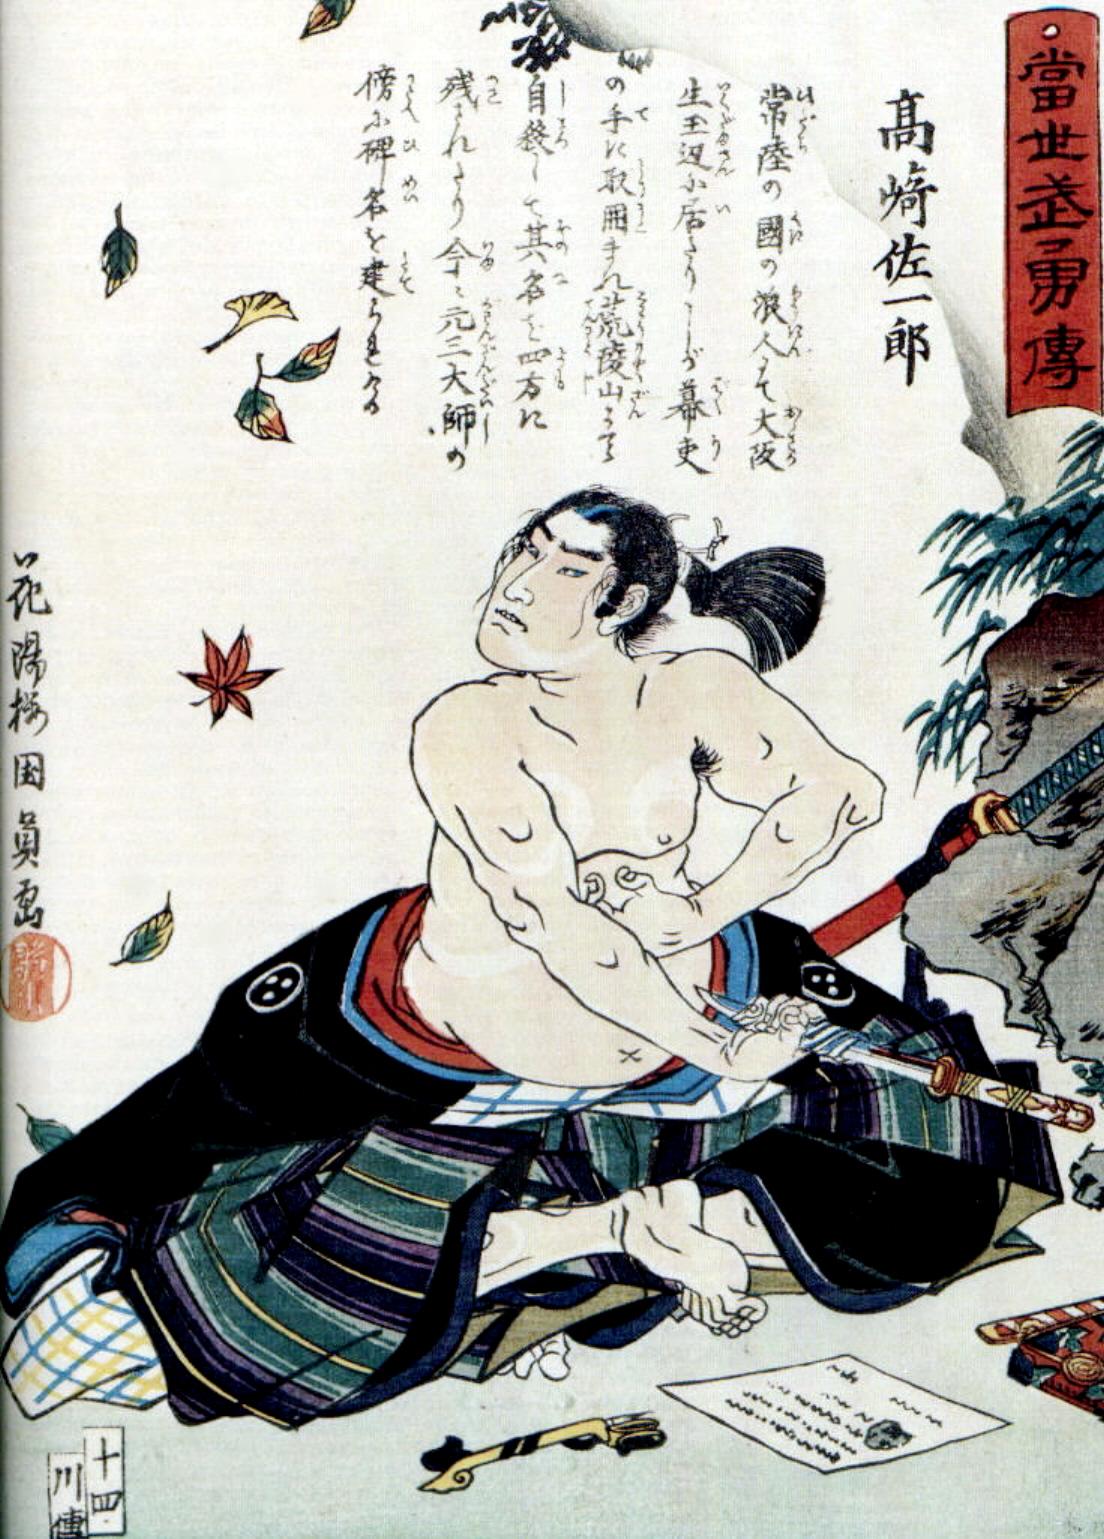 Drawn samurai harakiri On and Samurai this Seppuku